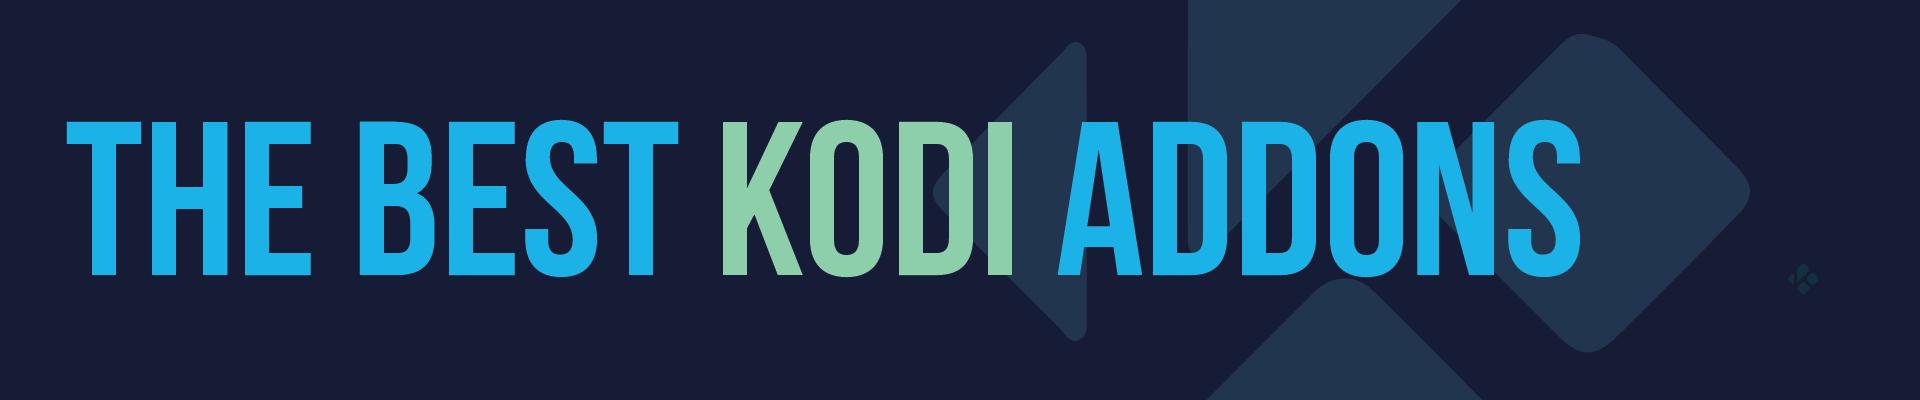 The Best Addons for Kodi 2019 | BestVPN org